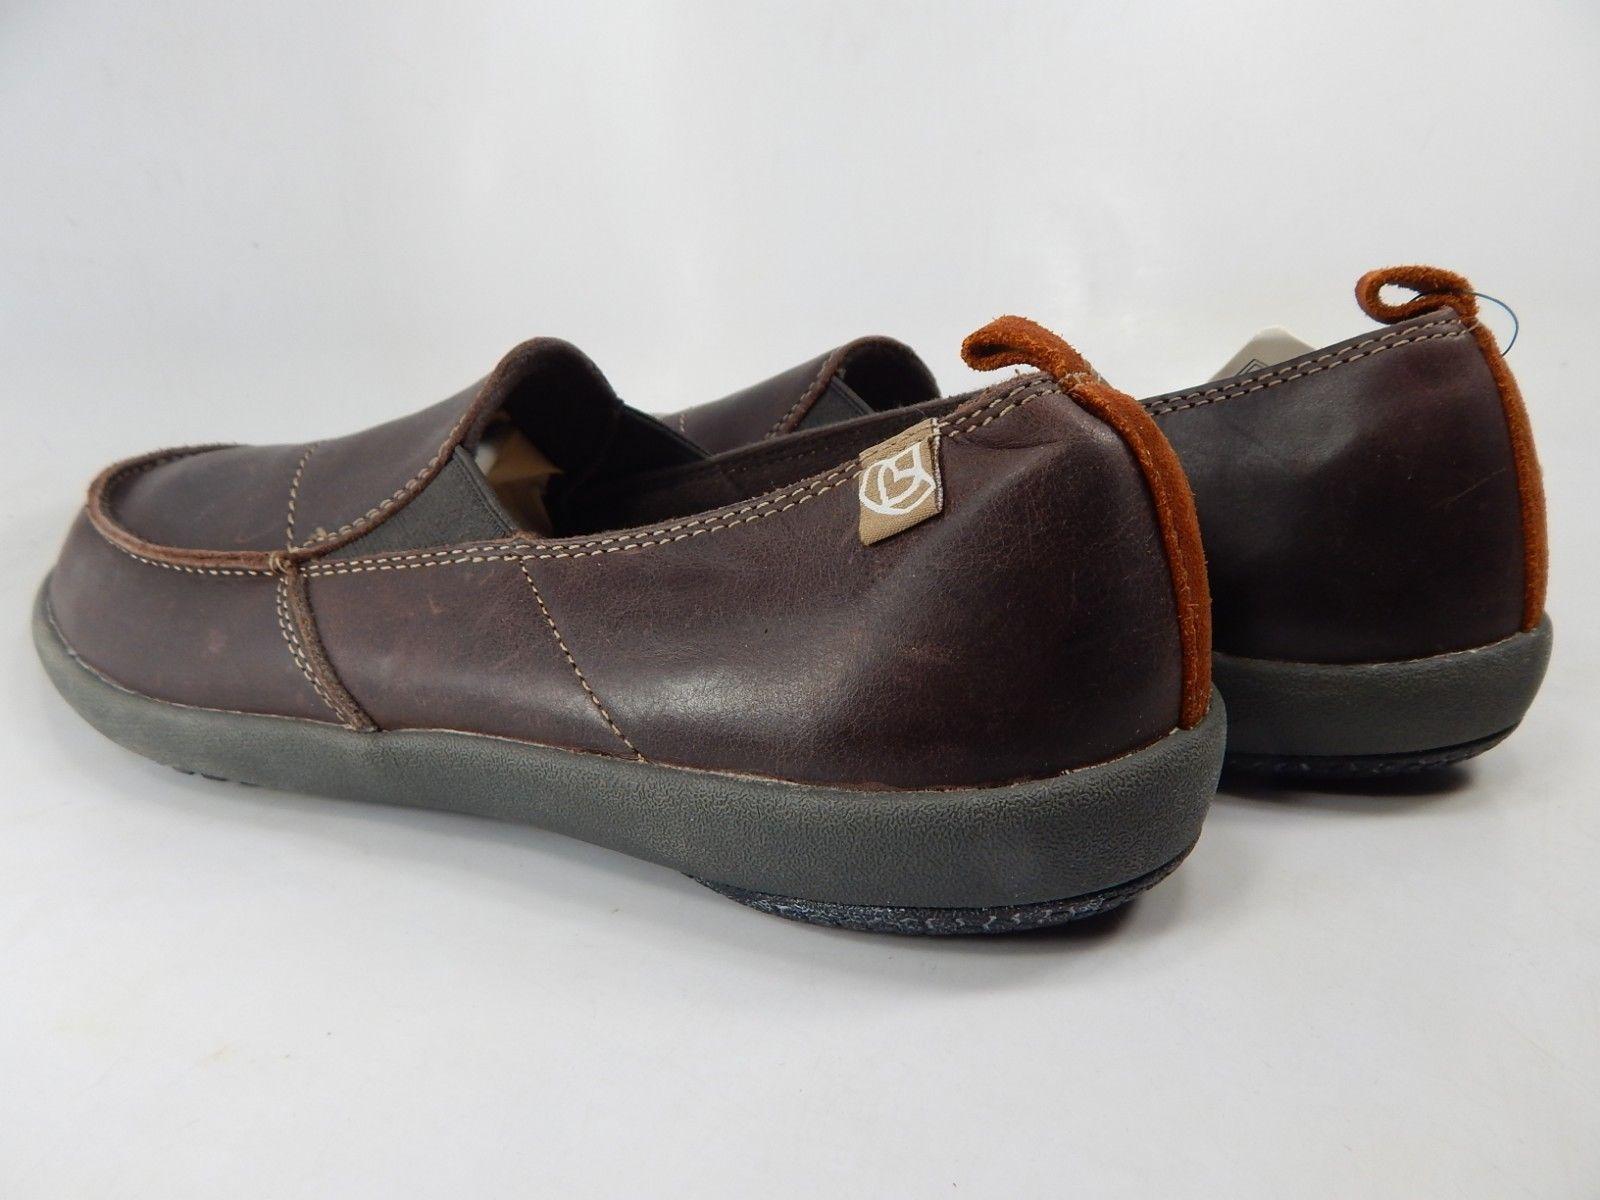 Spenco Siesta Size US 9 M (D) EU 42.5 Men's Slip On Leather Casual Loafer Brown